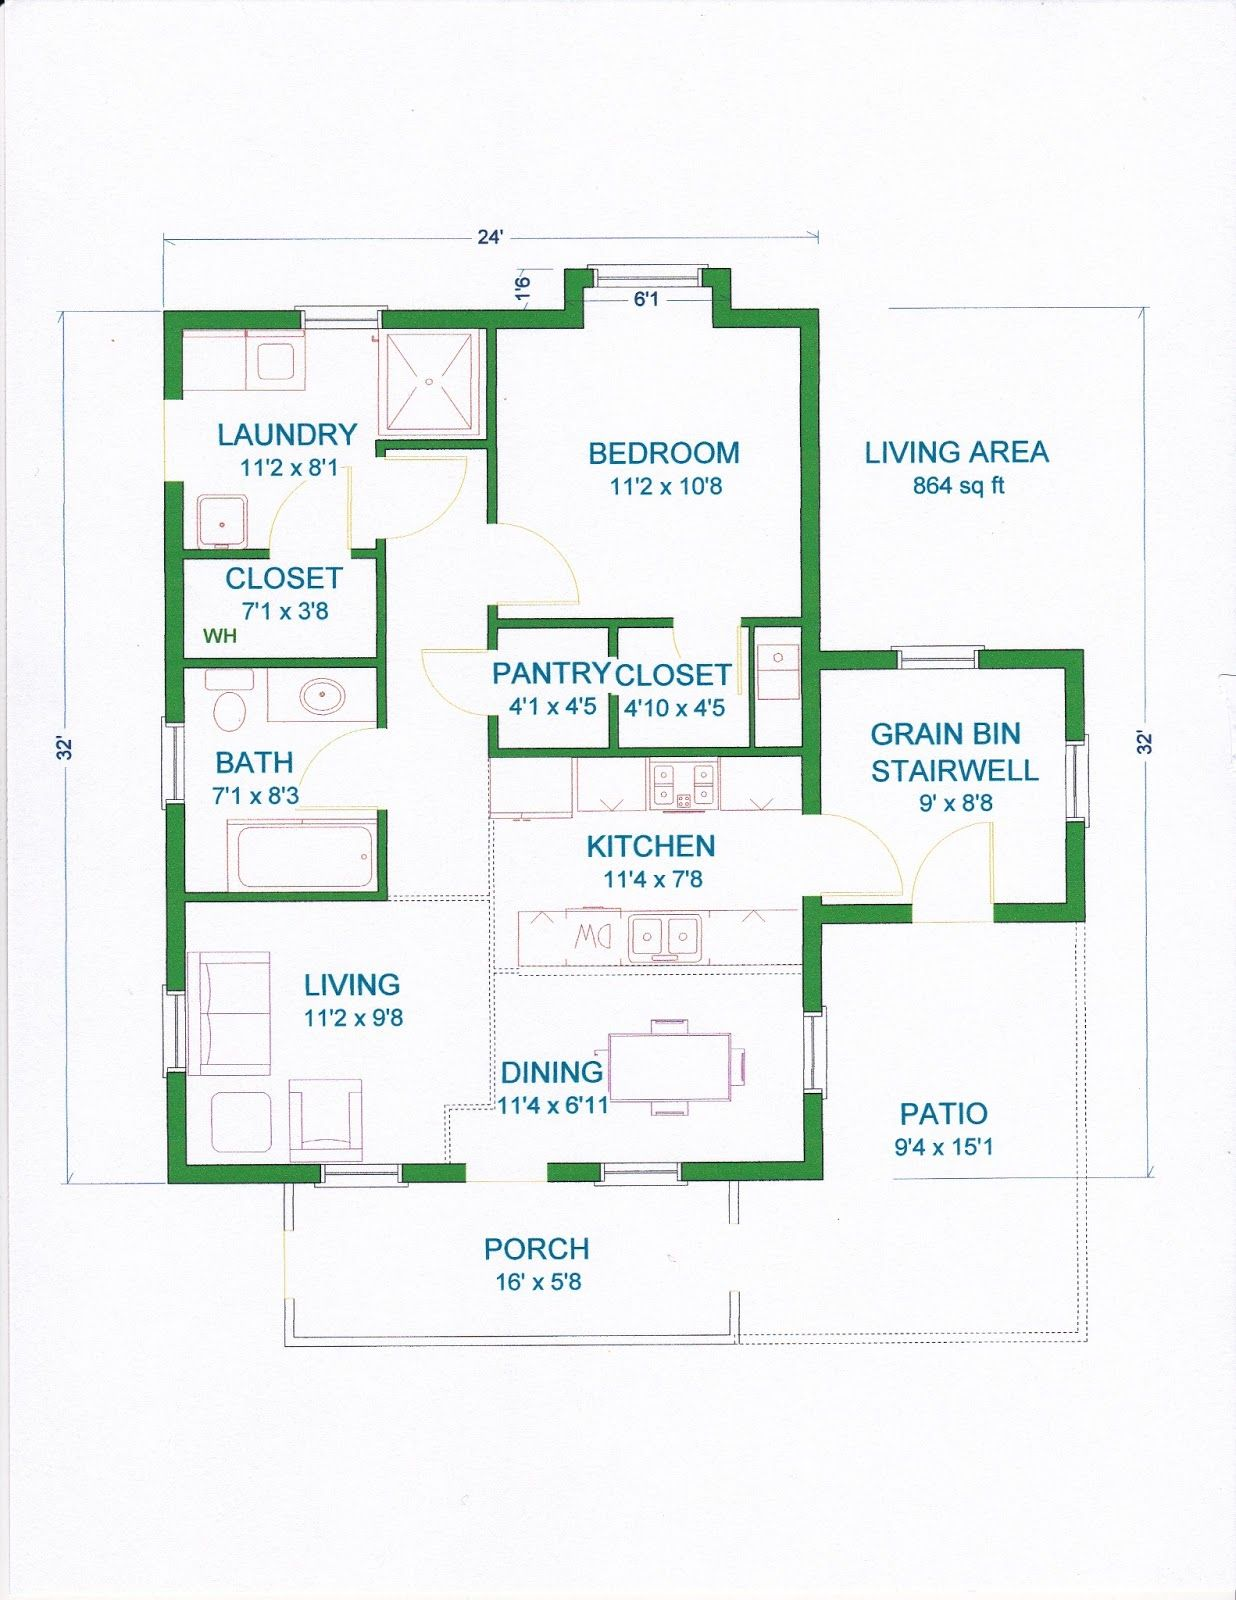 Grama Sue S Floor Plan Play Land Gambrel Barn Home 24 X32 Small House Plans Open Floor House Plans Cabin Plans